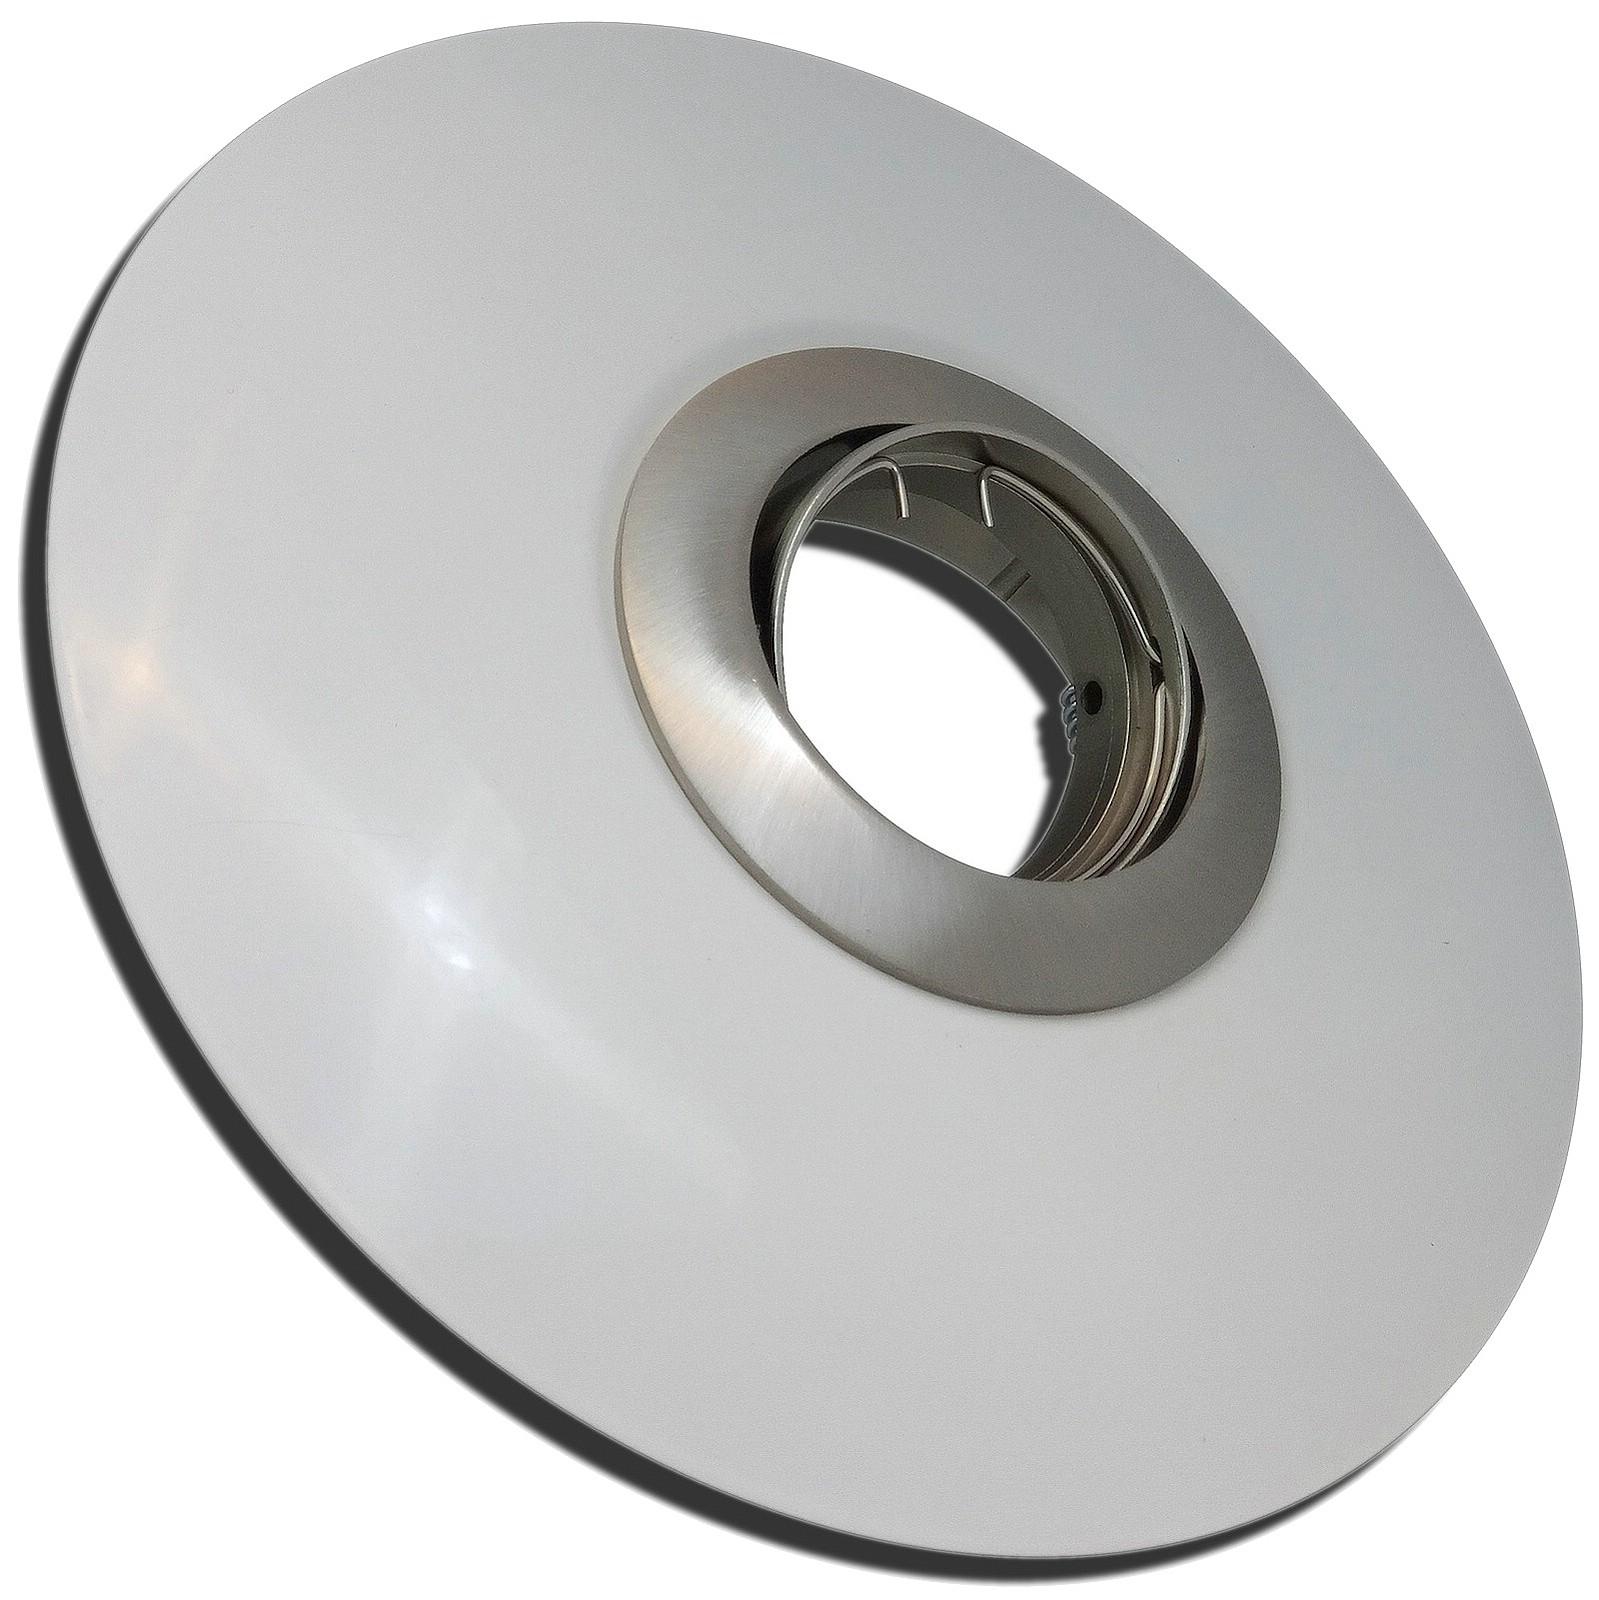 Lampen 12 Volt : W glas einbaustrahler maja volt led gu starr lampen platz